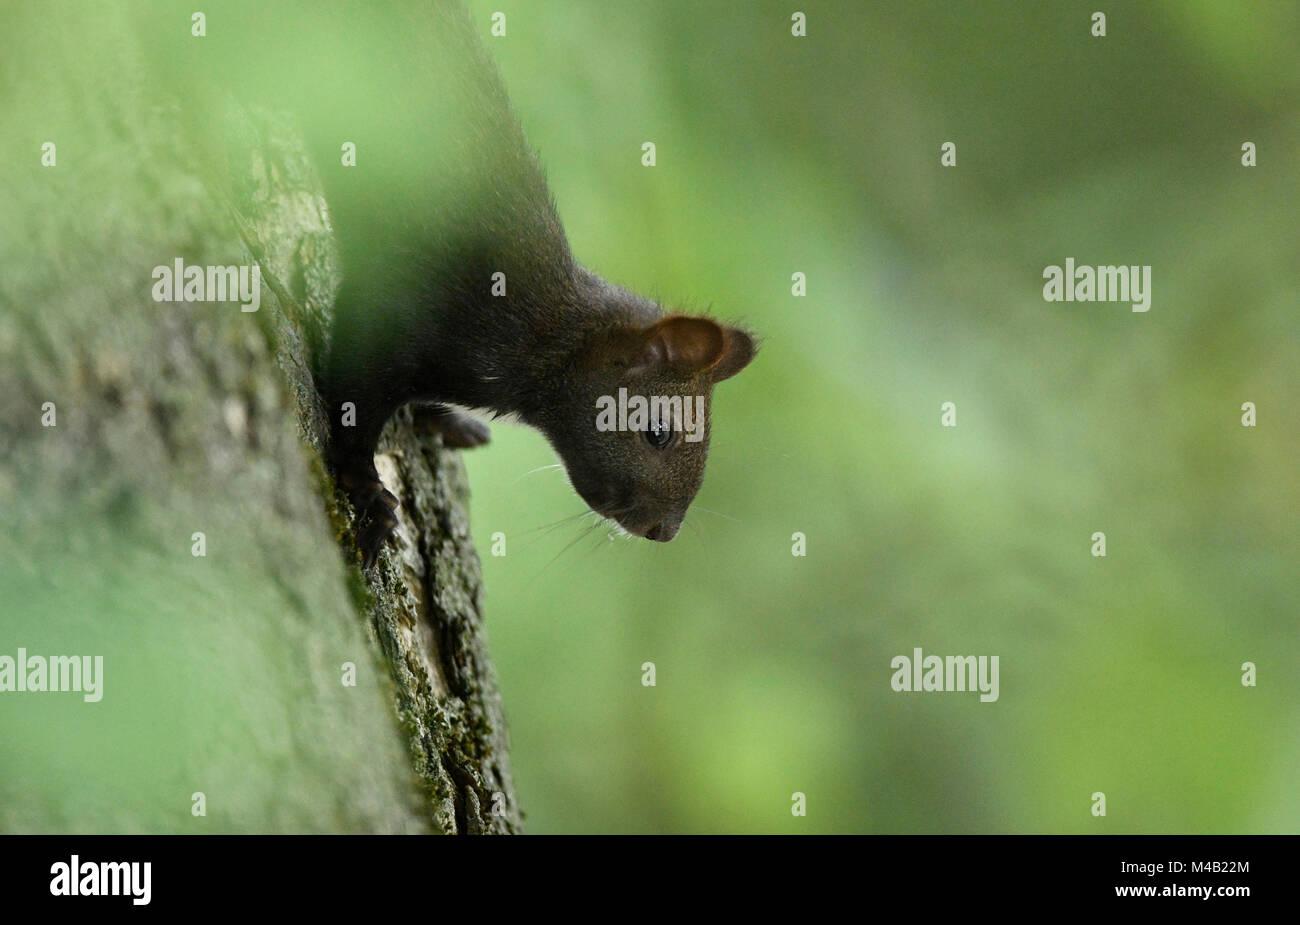 Squirrels (Sciurus vulgaris),melanistic animal,red squirrel,in trunk,Stuttgart,Baden-Wurttemberg,Germany - Stock Image